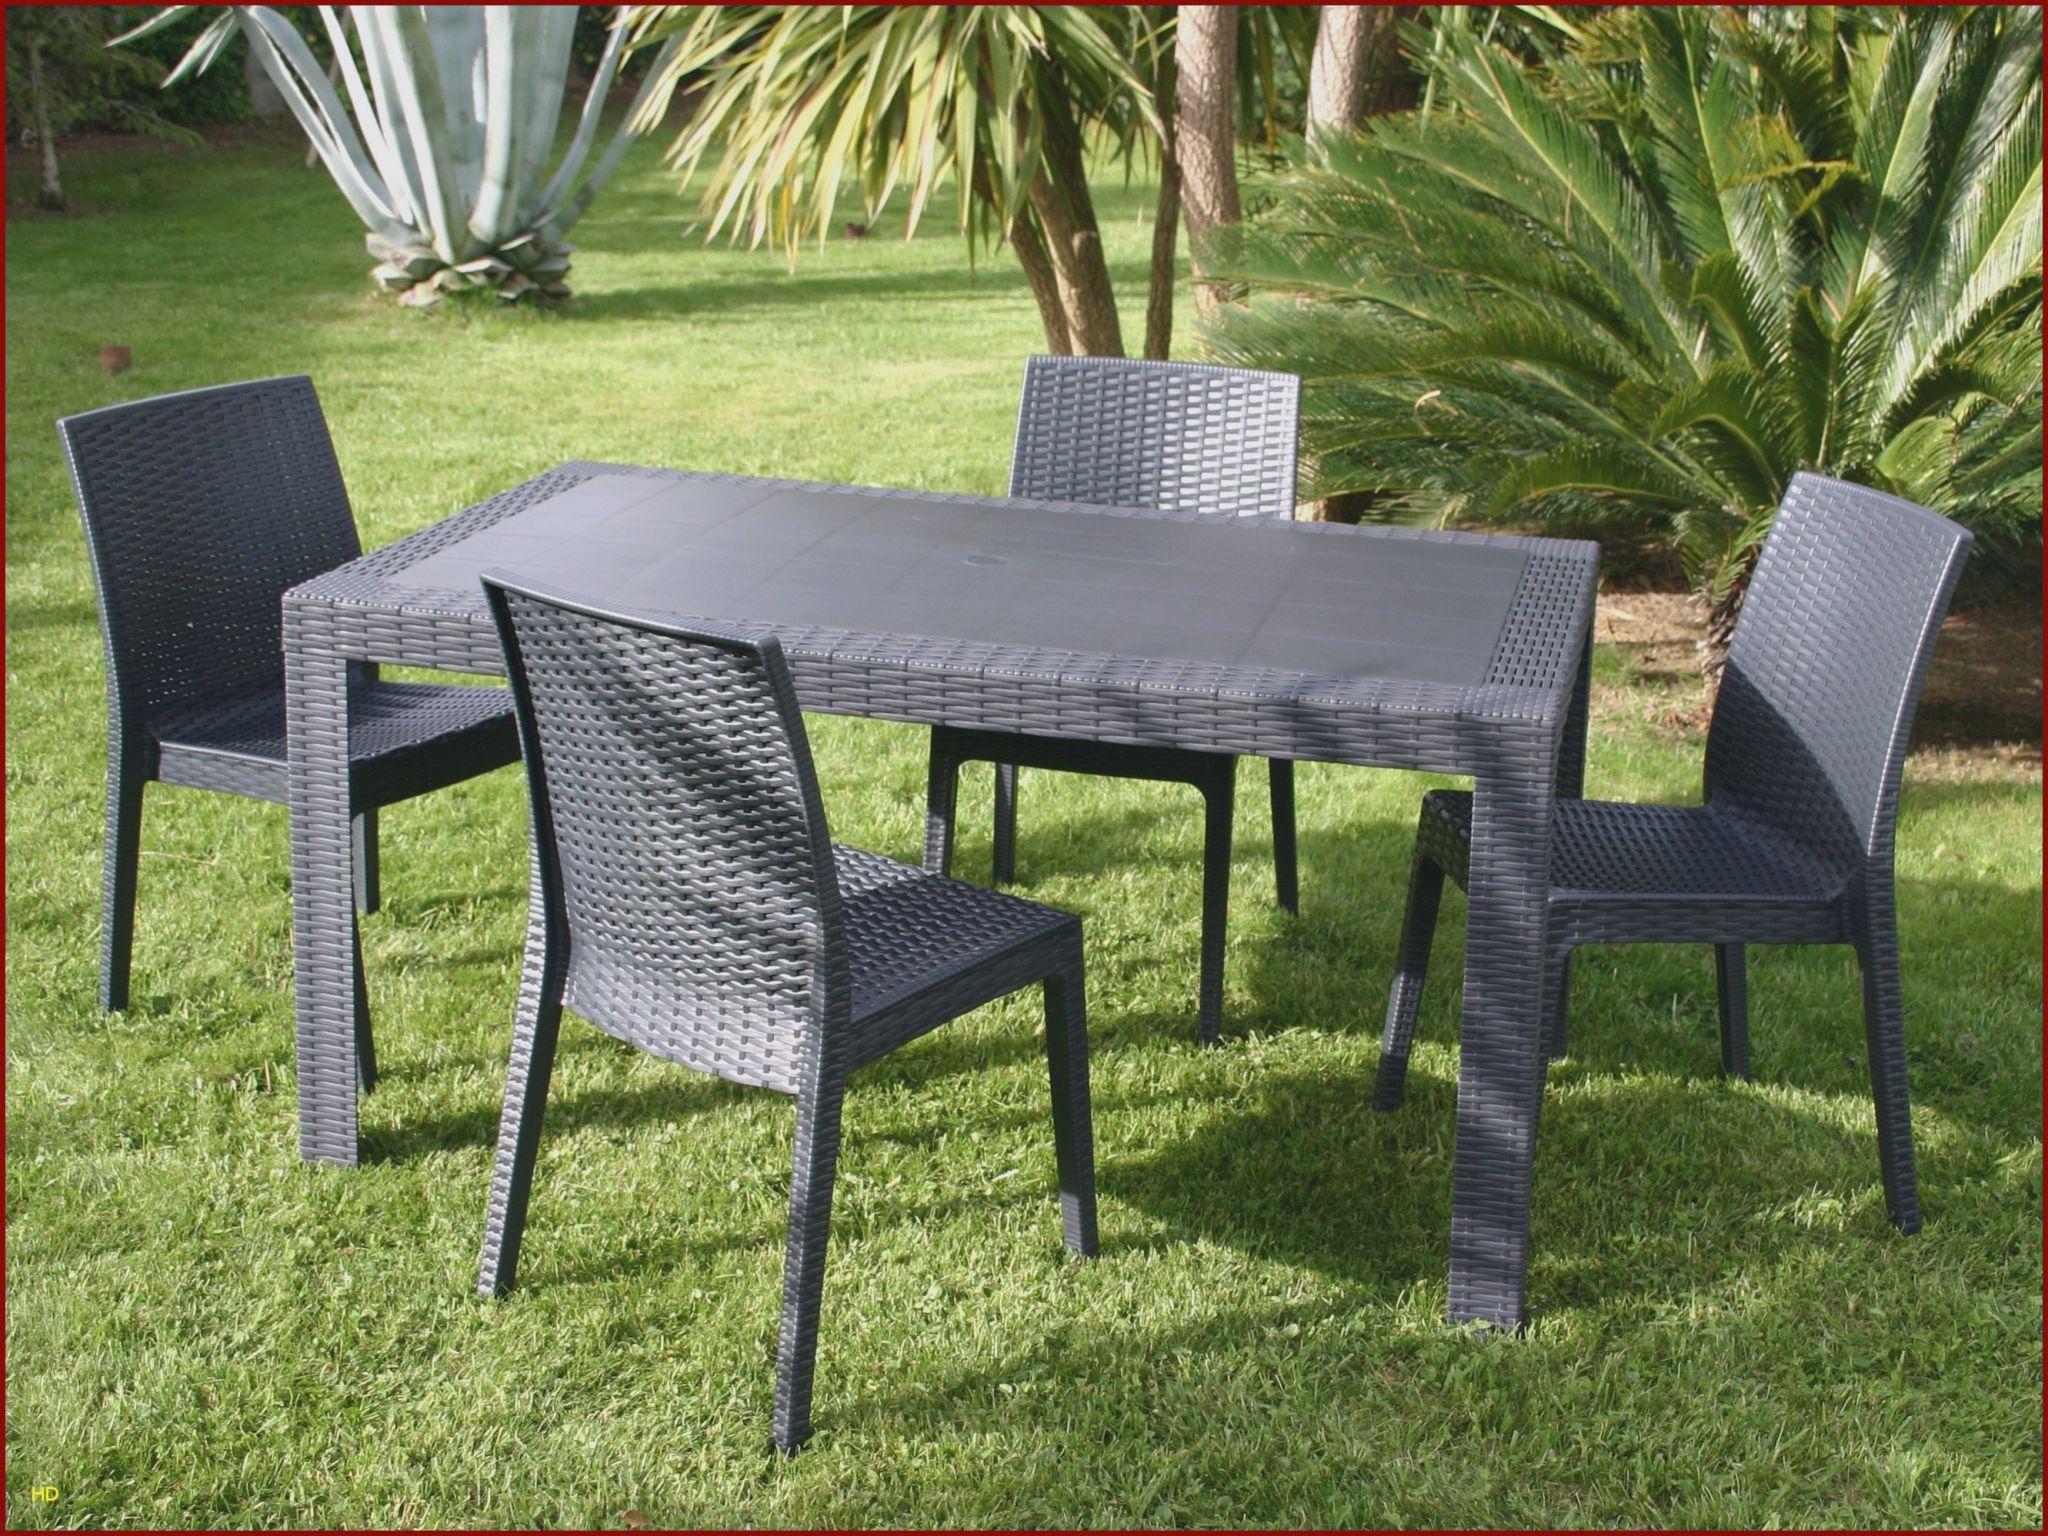 Hesperide Chaise Génial Chaises Luxe Chaise Ice 0d Table Jardin Resine Lovely